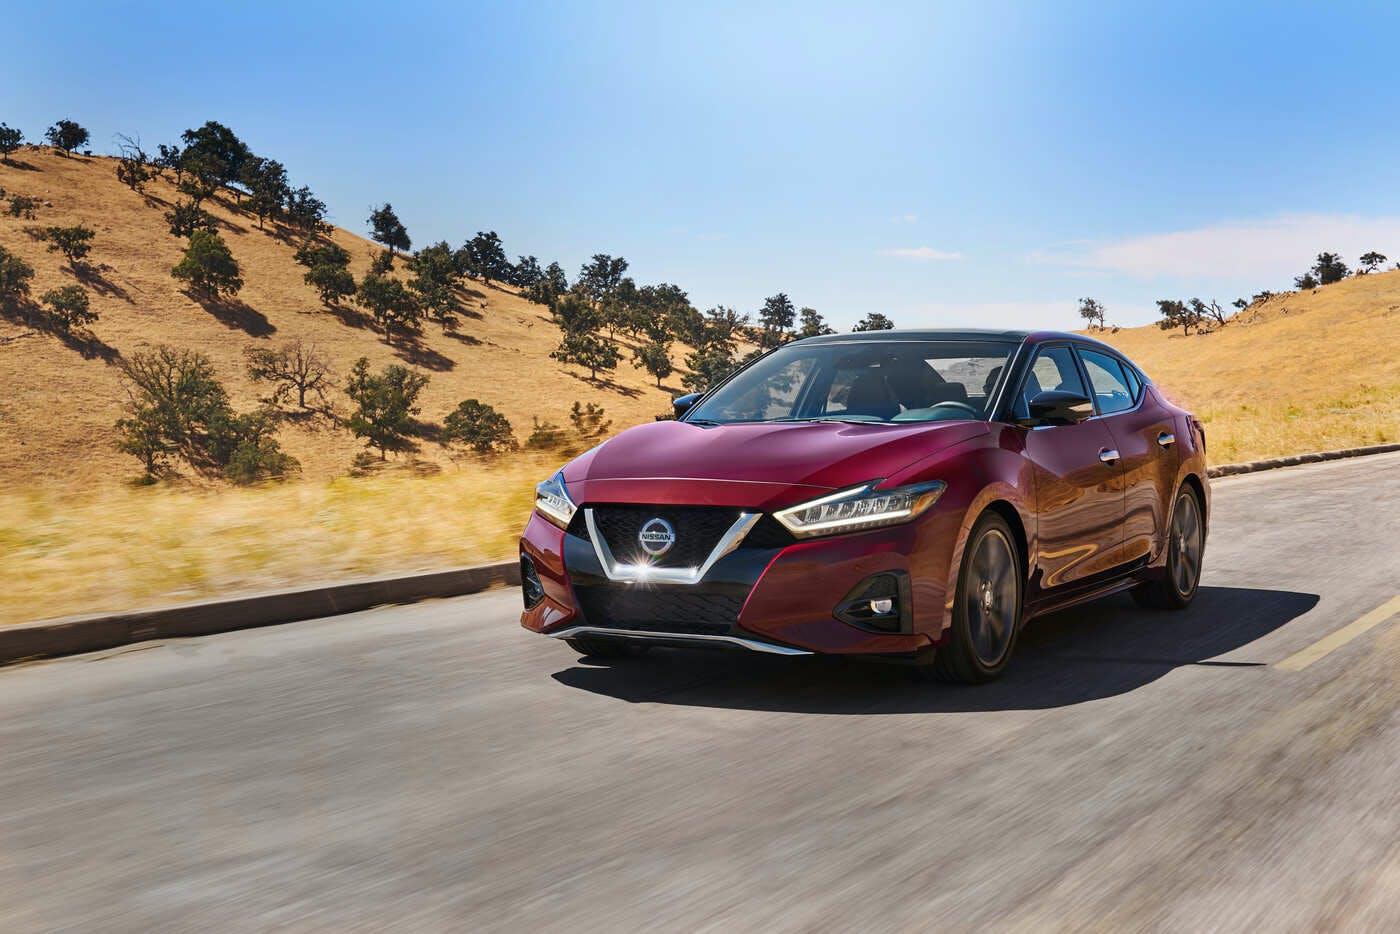 2019 Nissan Maxima Comparisons, Reviews & Pictures | TrueCar